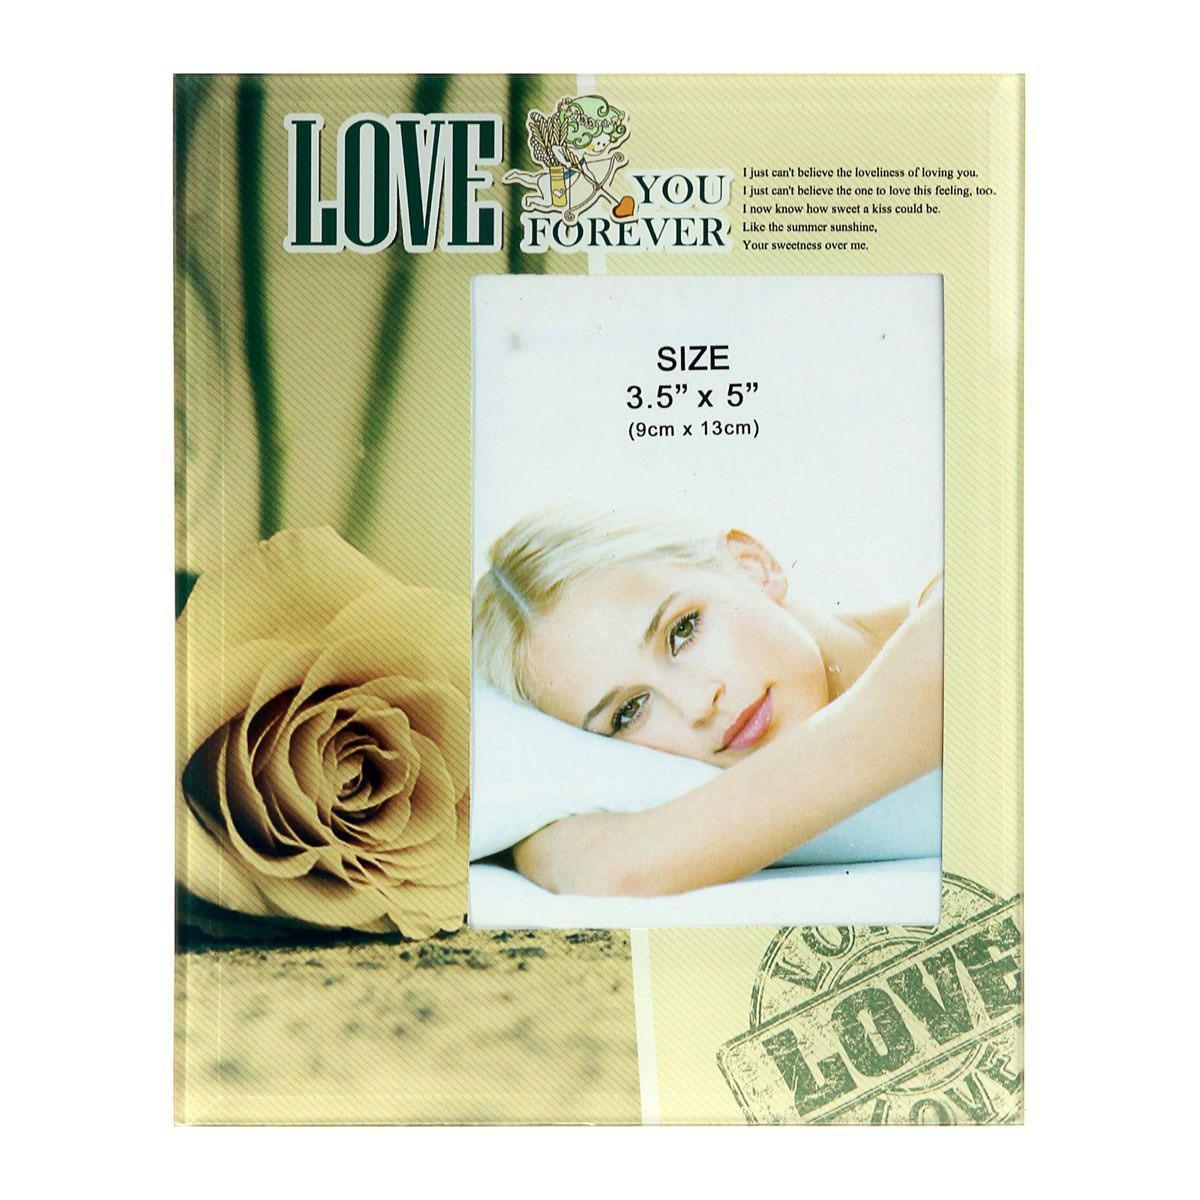 Фоторамка Sima-land Желтая роза Love, 9 х 13 см фоторамка sima land леопард 9 х 13 см 803946